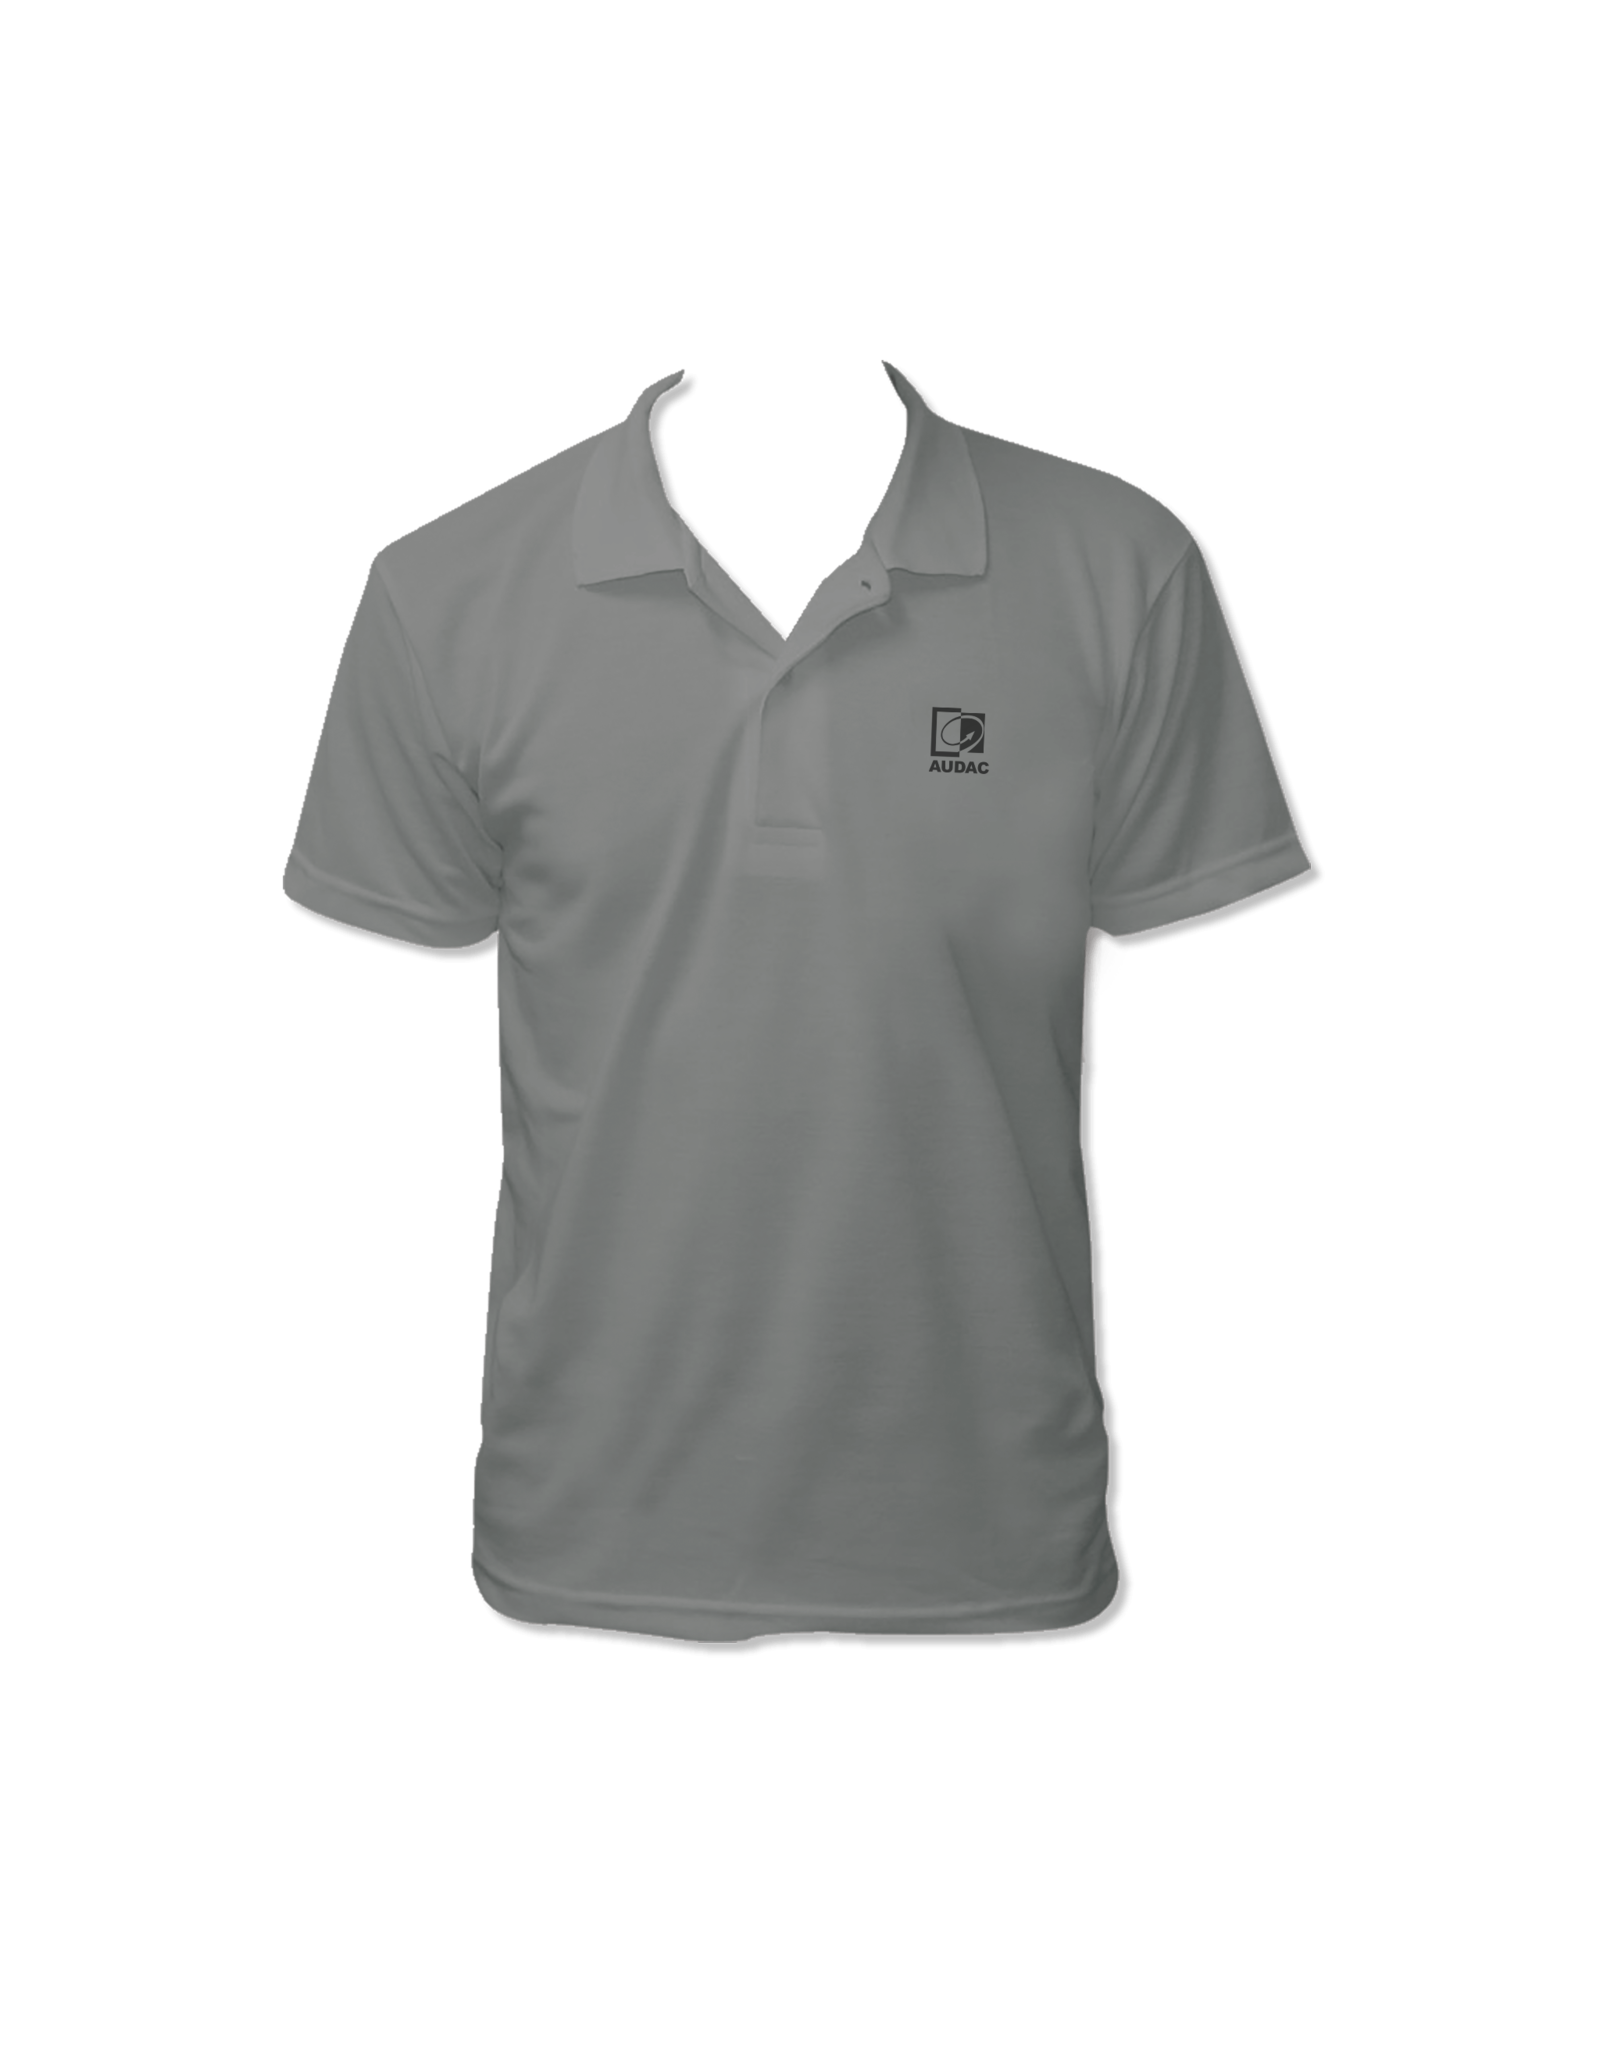 Audac AUDAC polo shirt Small